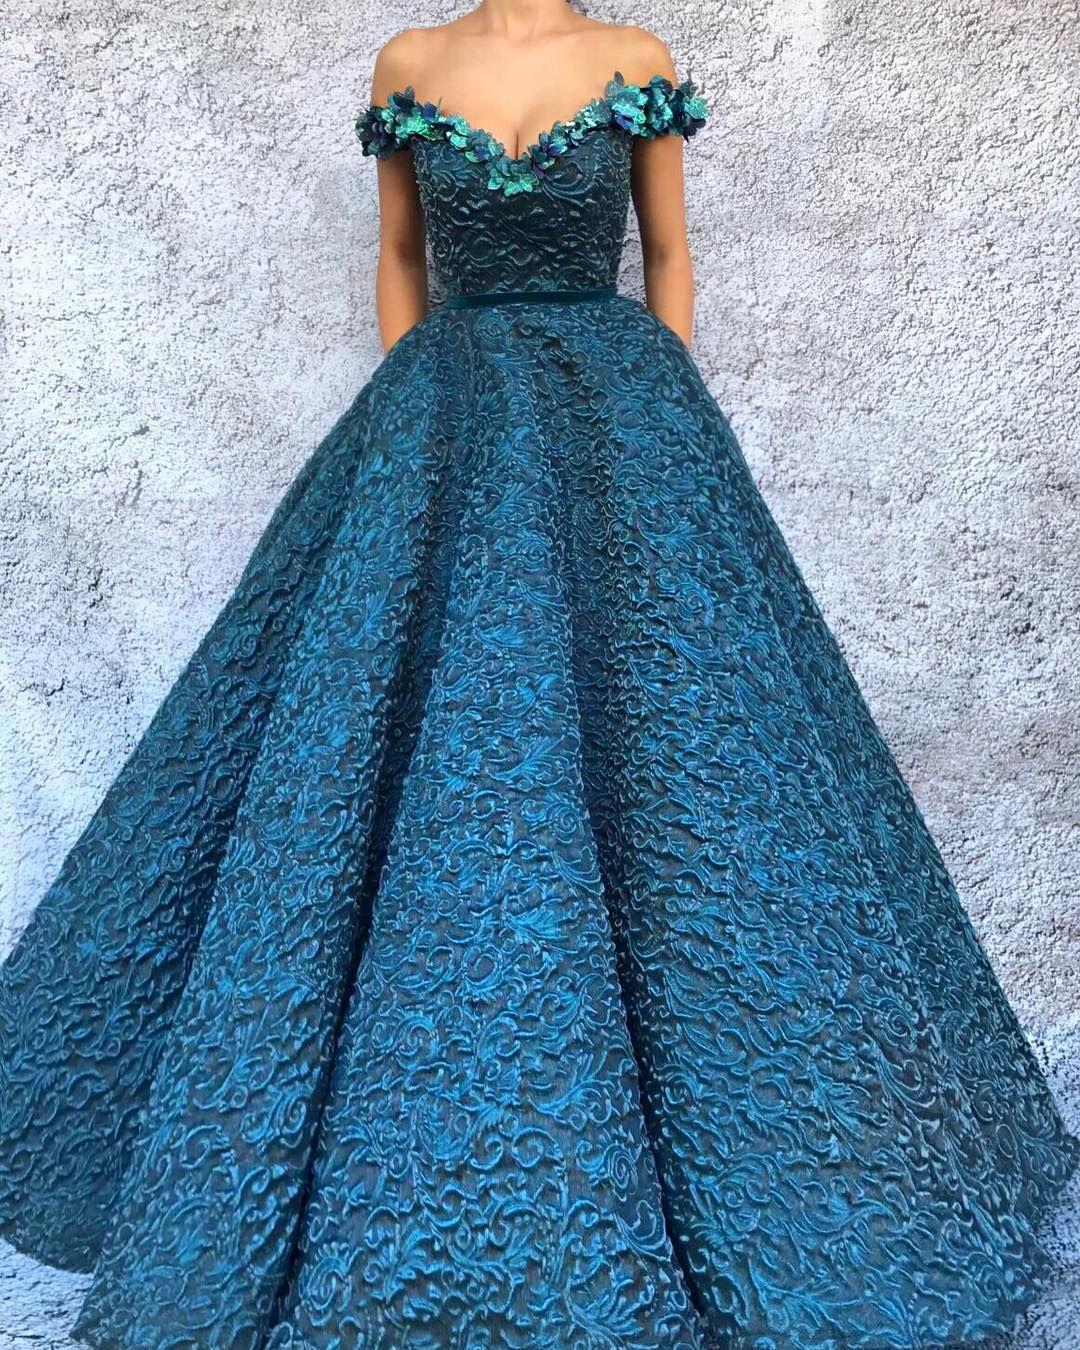 فساتين سهرة وخطوبة Gowns Fancy Dresses Long Gowns Dresses